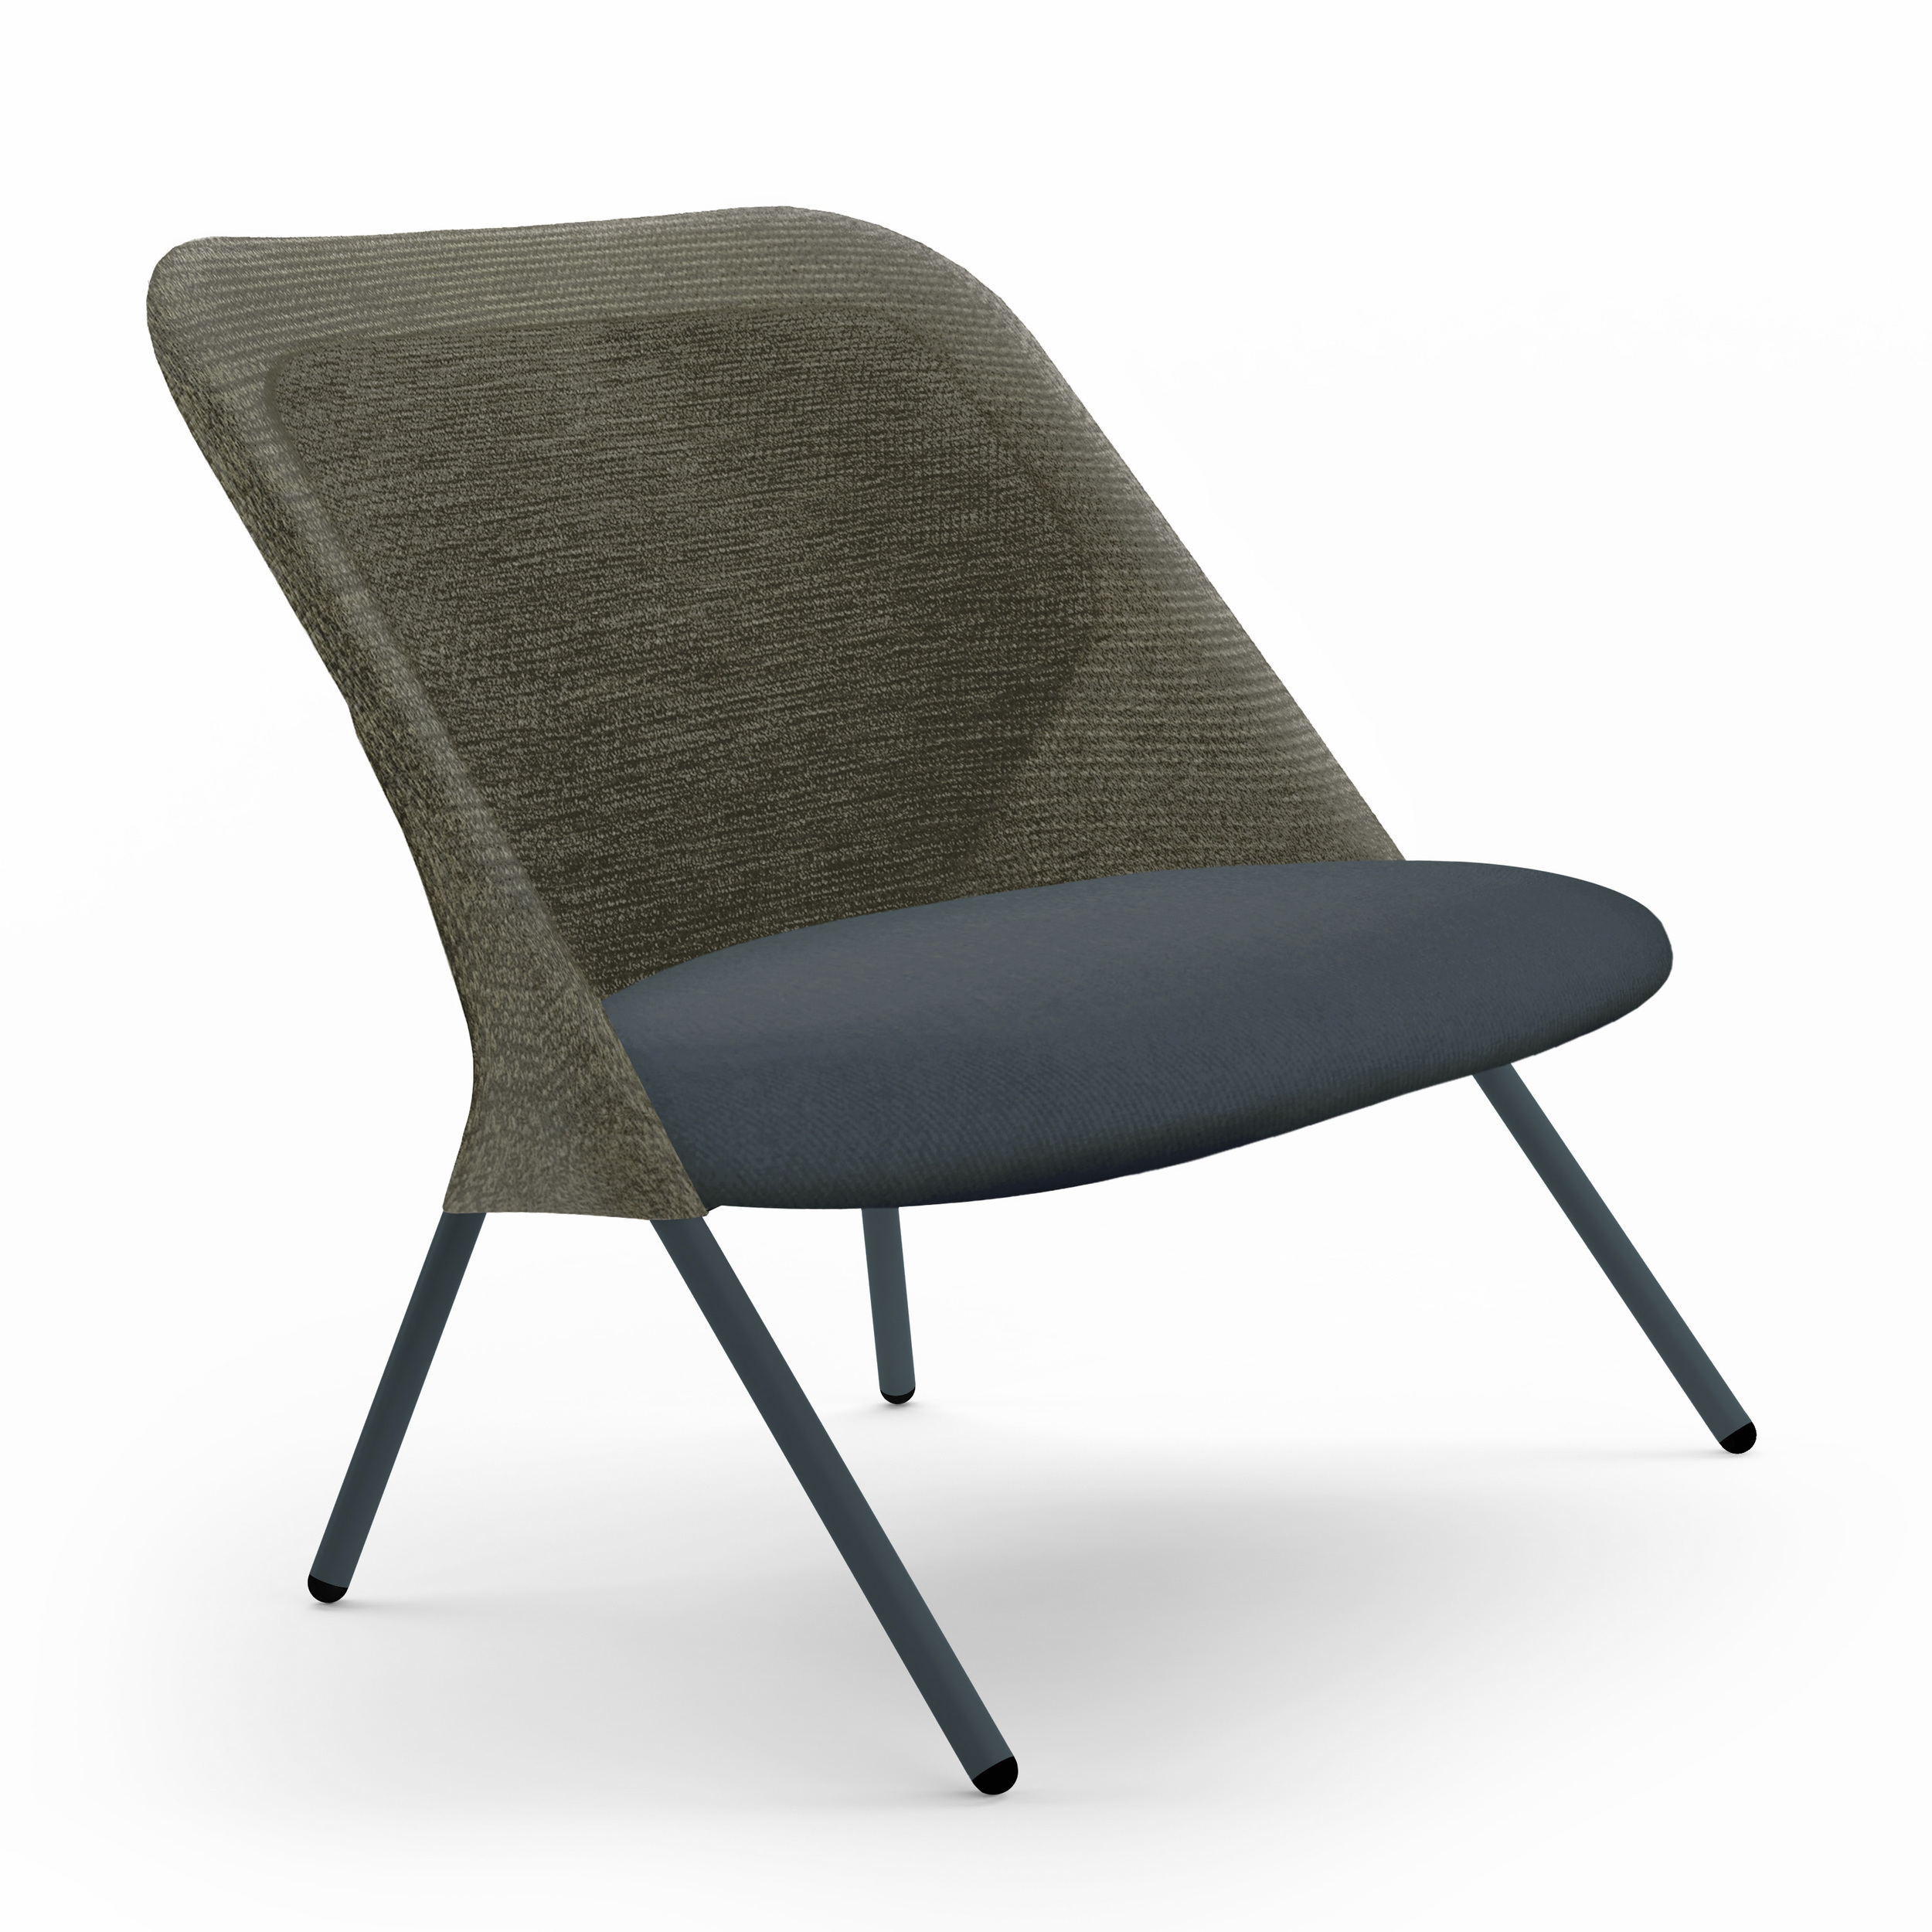 shift_lounge_chair_blue_grey-300dpi-moooi.jpg